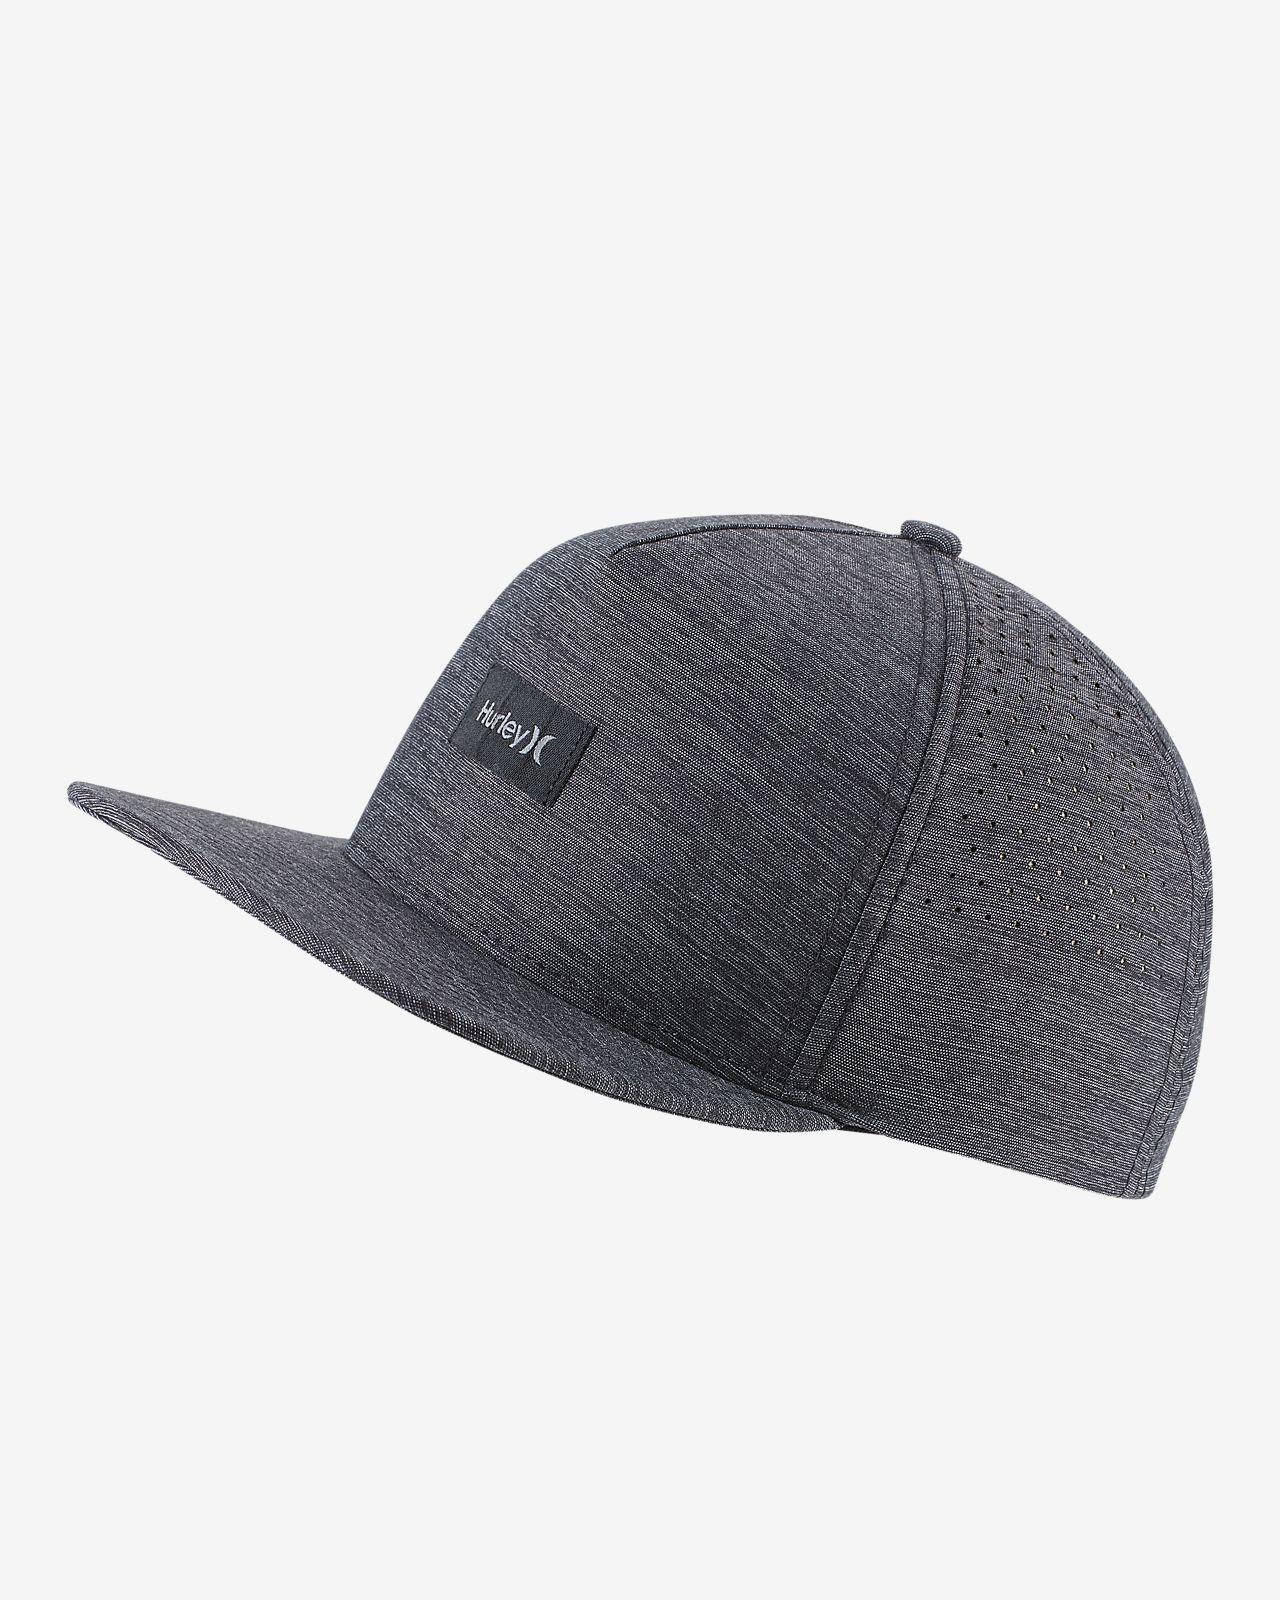 Cappello regolabile Hurley Dri-FIT Staple